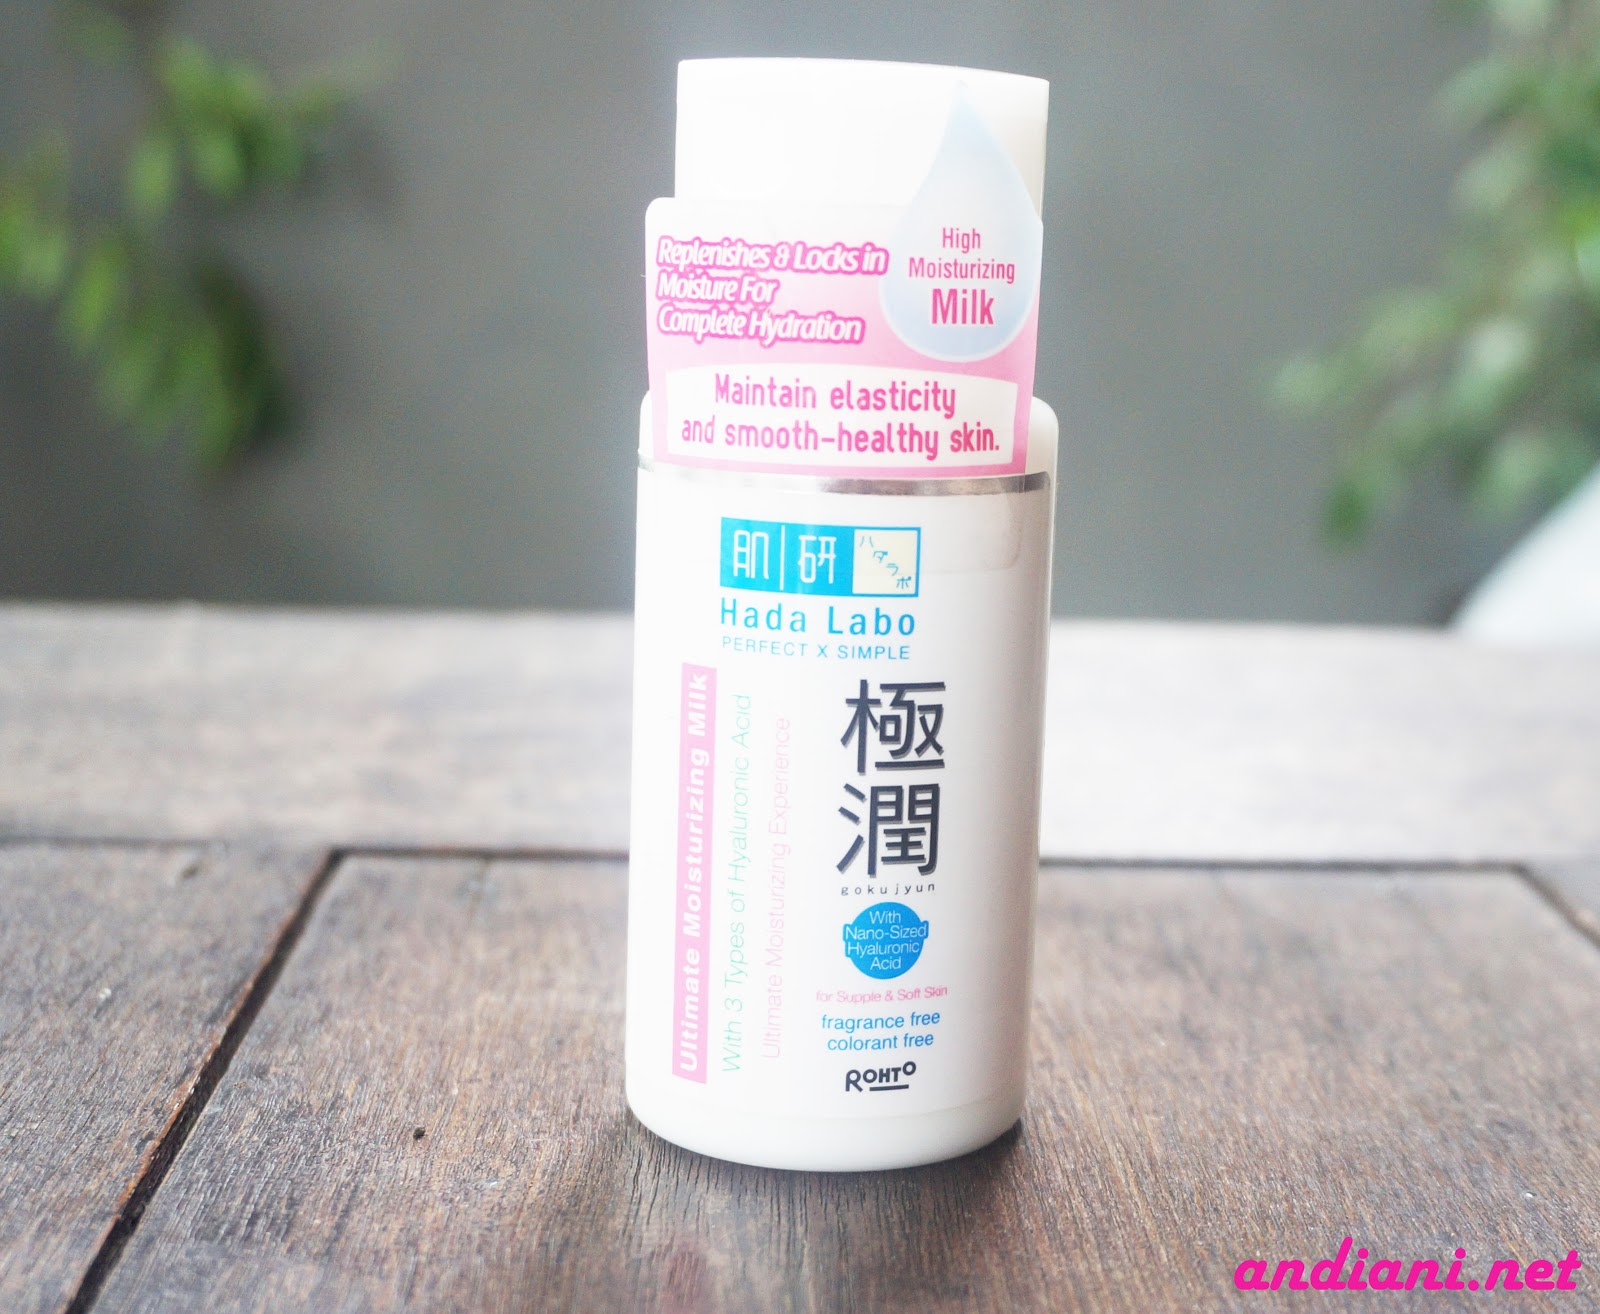 My Skincare Hadalabo Untuk Kulit Berminyak Andianis Beauty Hada Labo Gokujyun Starter Pack Pelembab Ultimate Moisturizing Milk